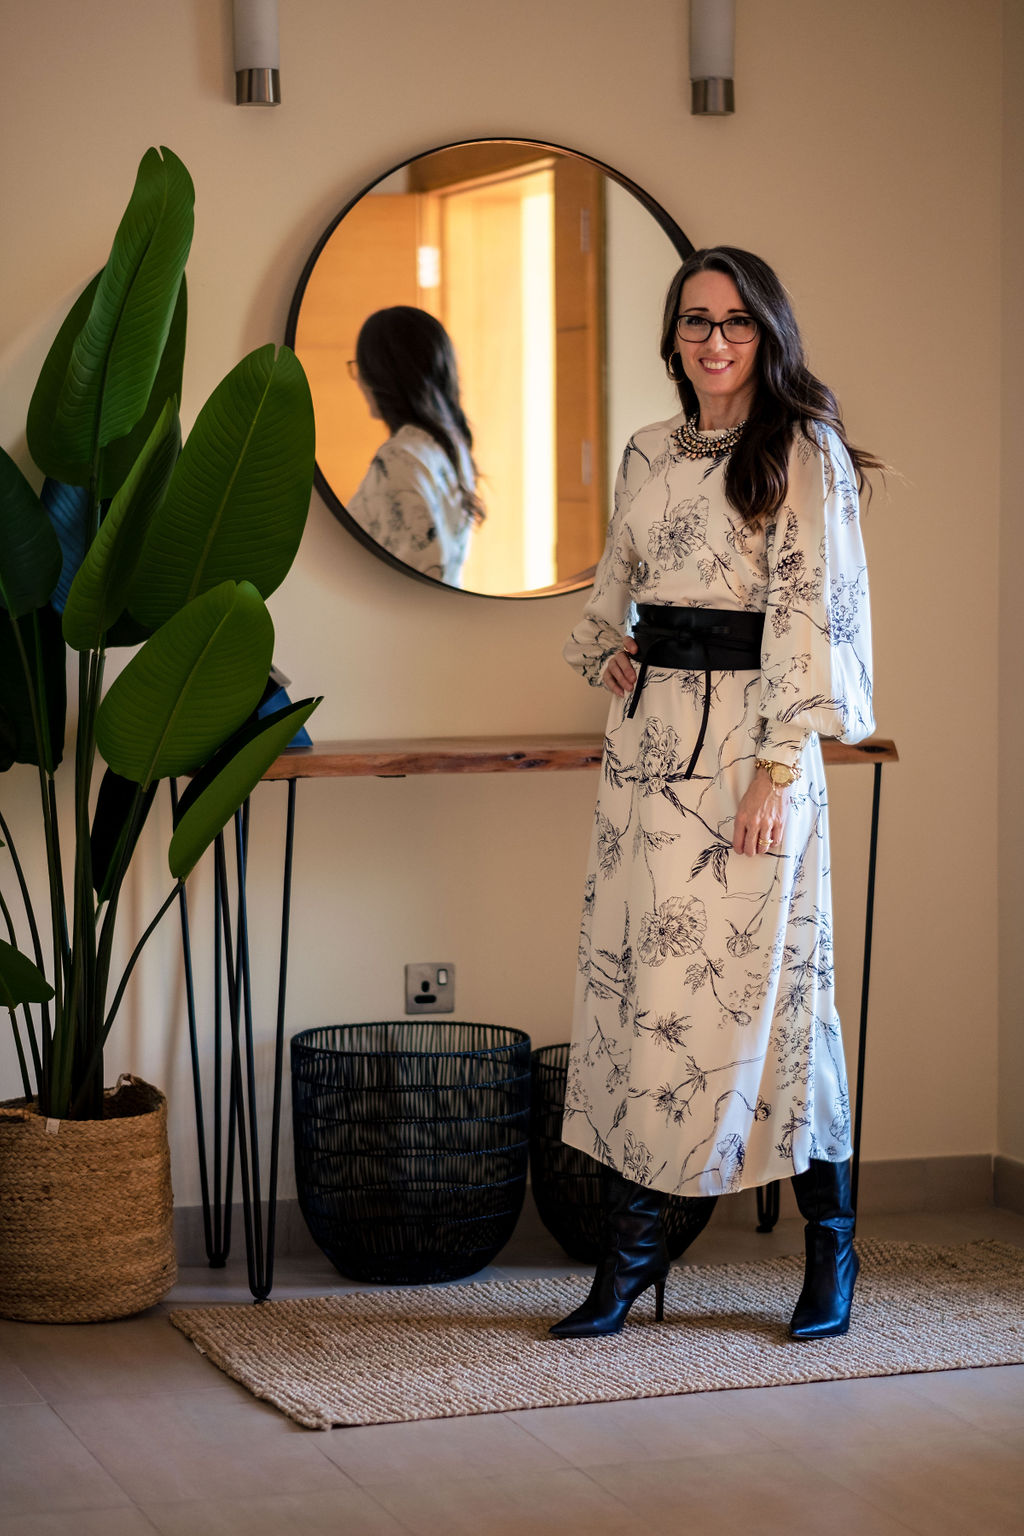 Method39, method to style, one dress three ways, versatility, style advice, details, ecru, cream, floral print, belt, modest style, cuffs, buttons, black boots, heels, photoshoot